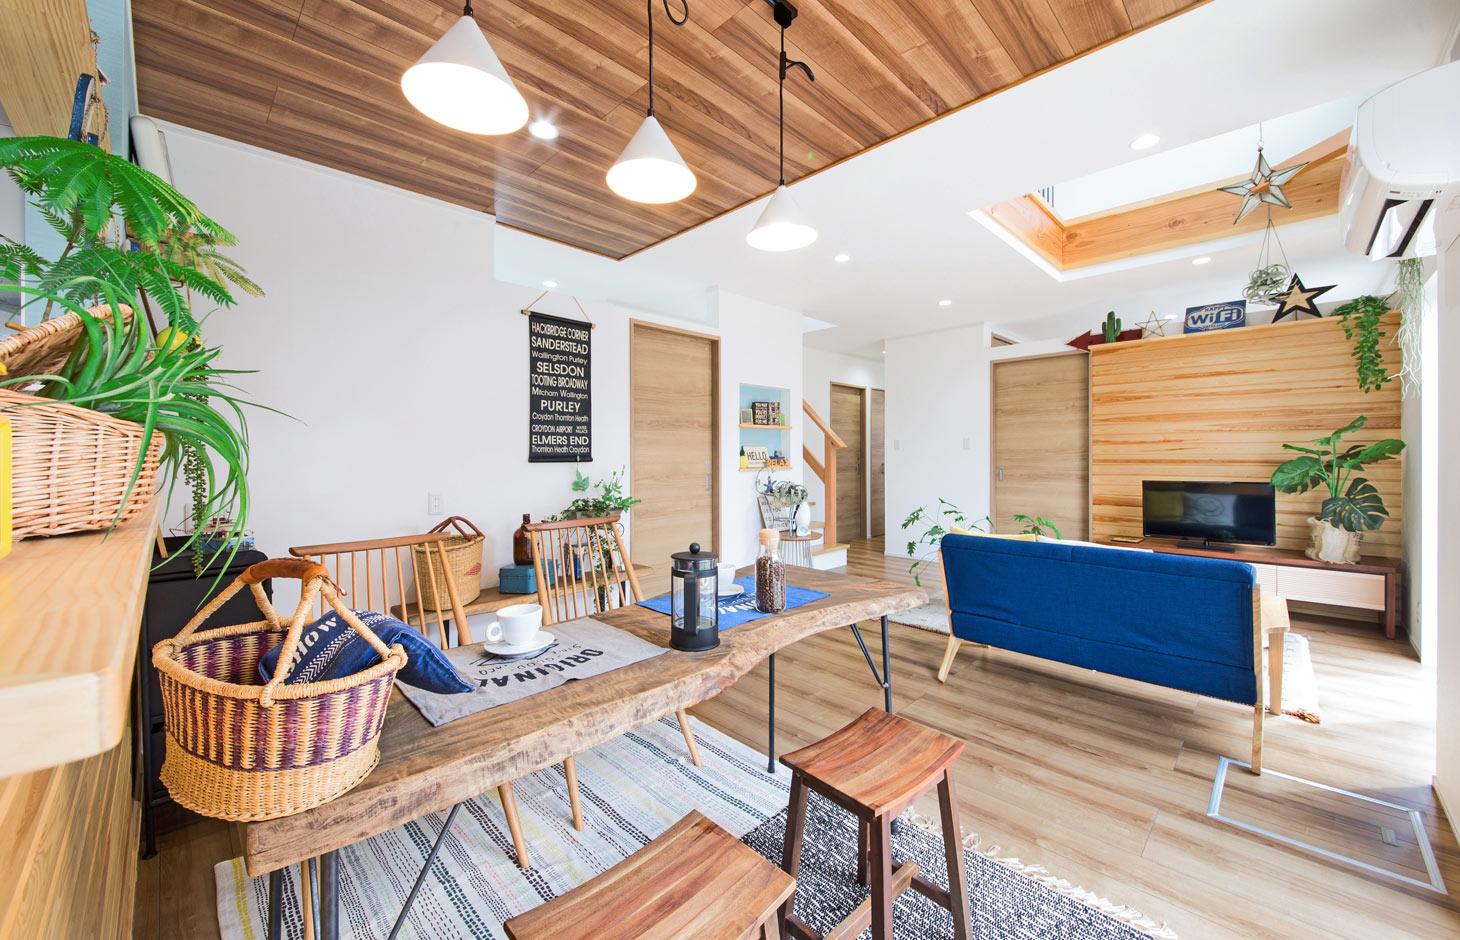 illi-to design 鳥居建設21【デザイン住宅、趣味、省エネ】天井や壁の一部に採用した羽目板がいい風合いだ